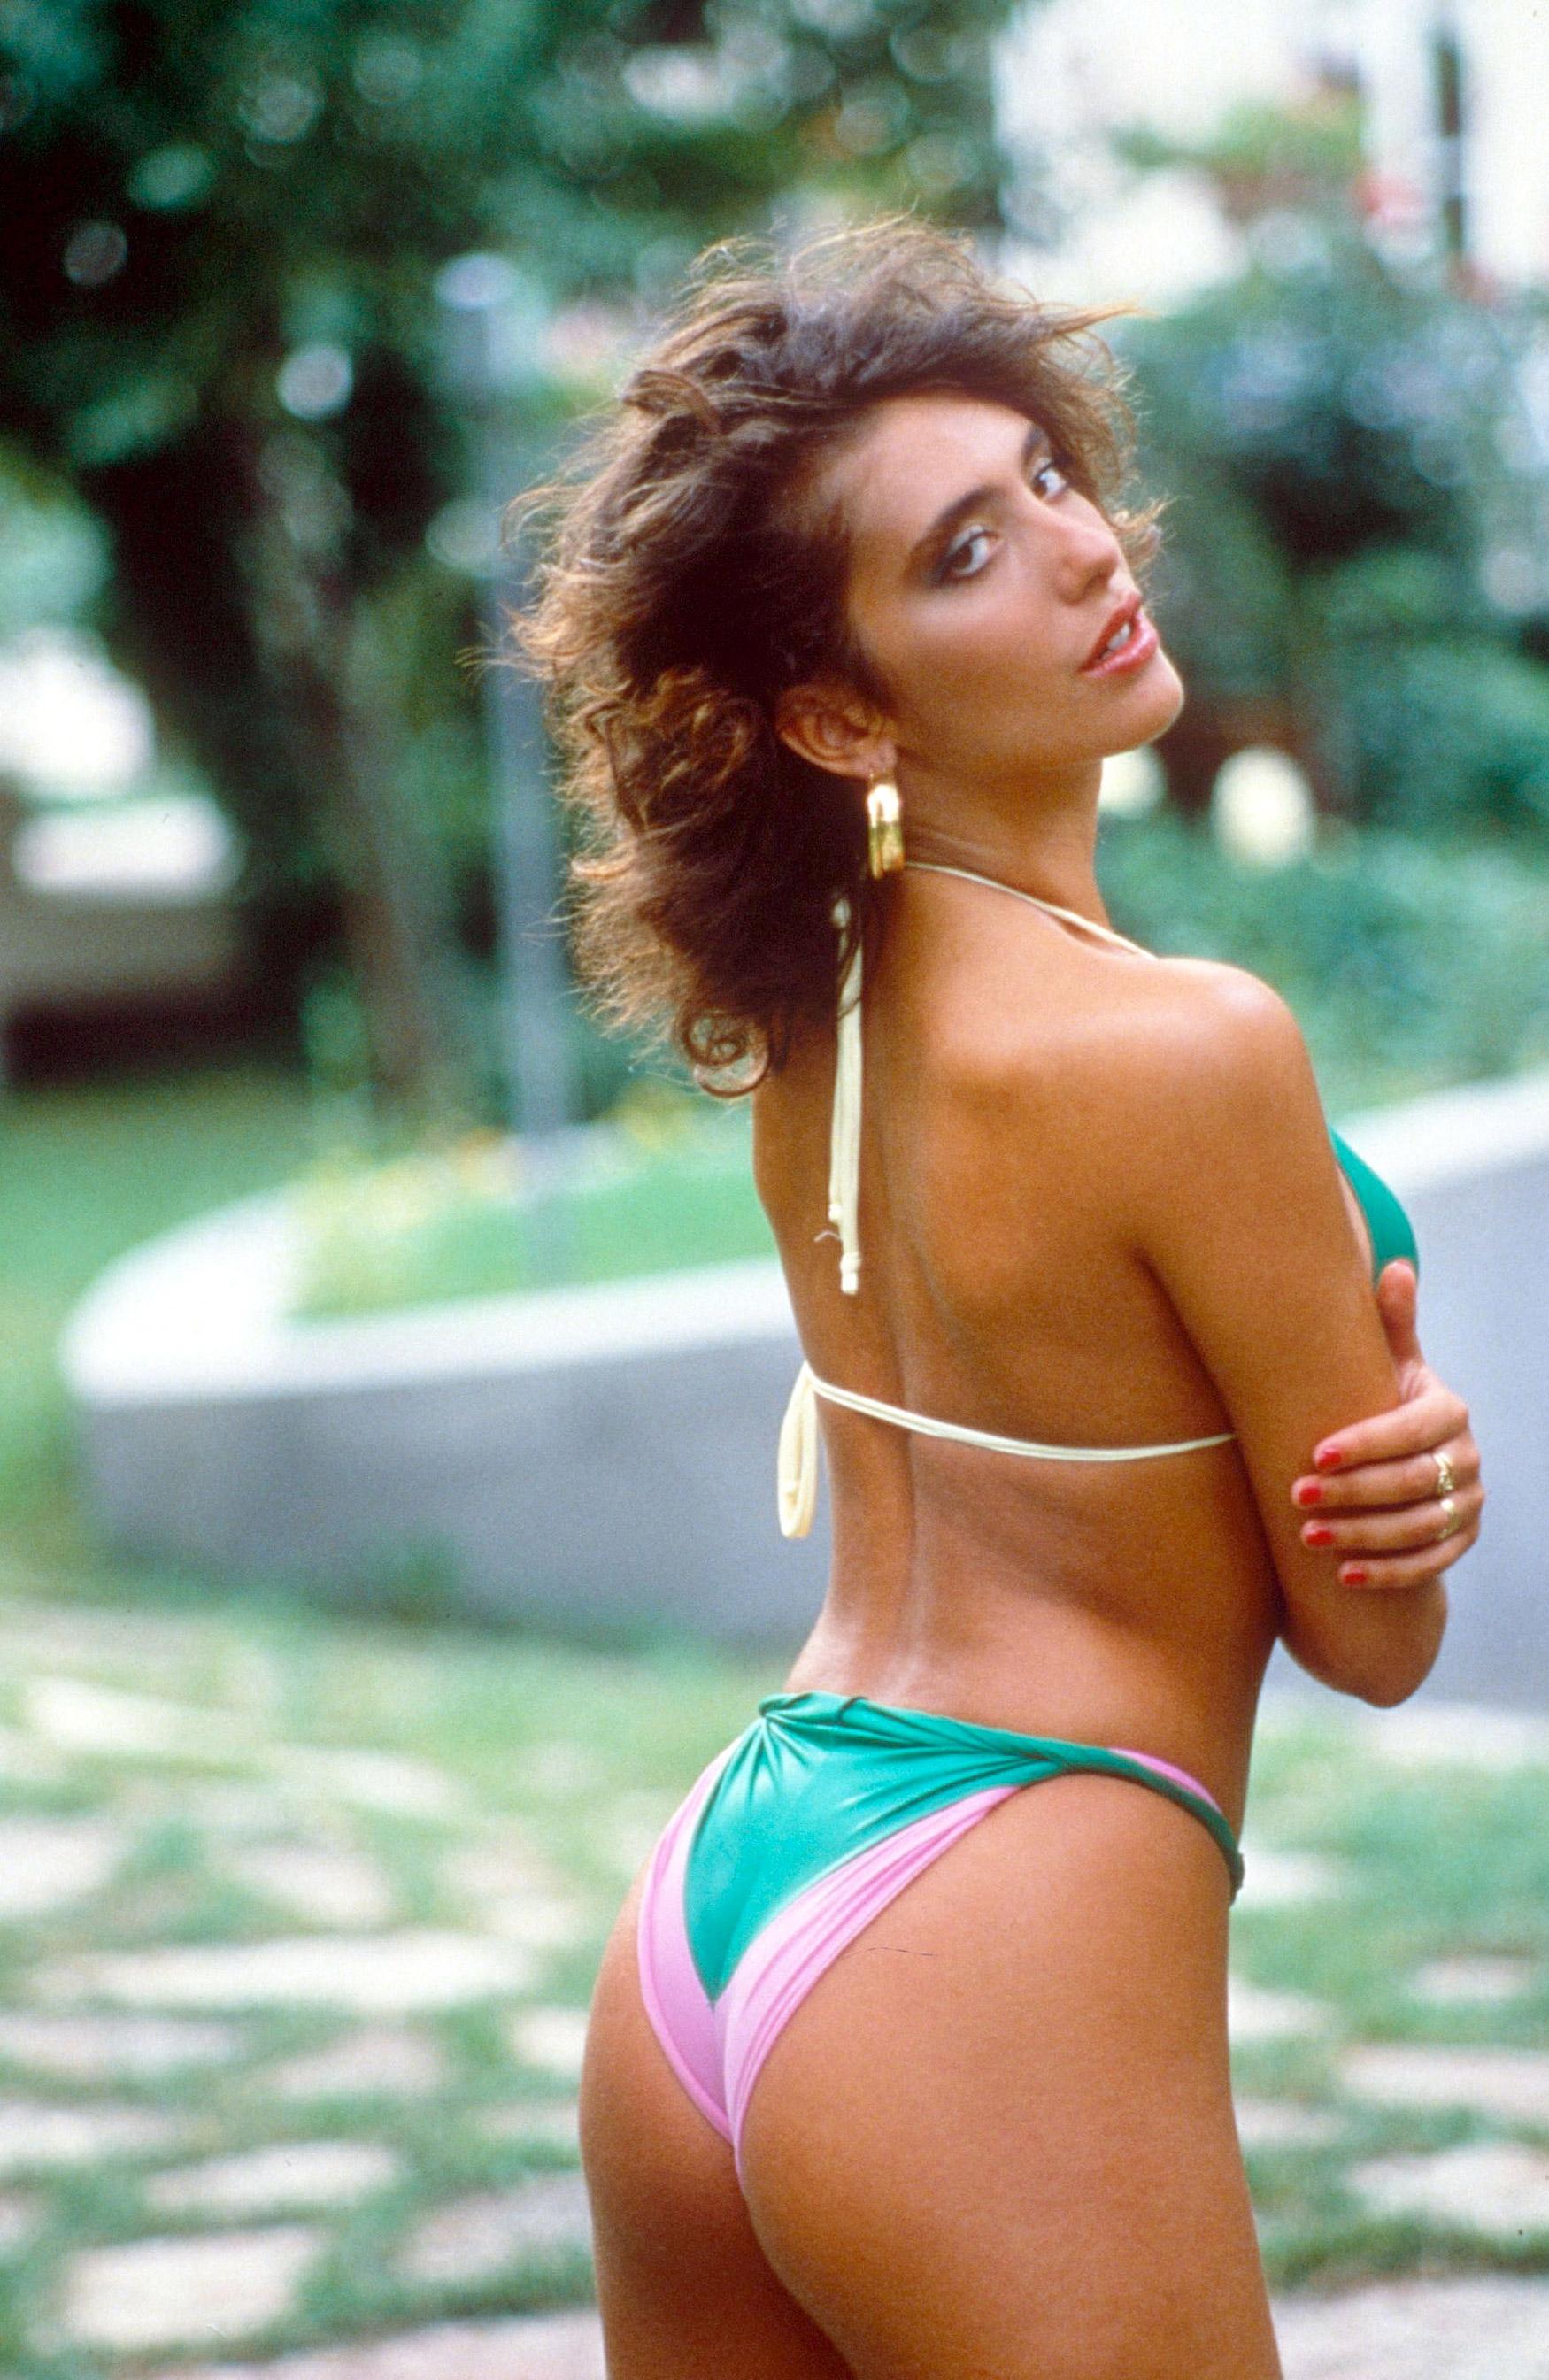 Paparazzi Sabrina Salerno nudes (46 pics), Sideboobs